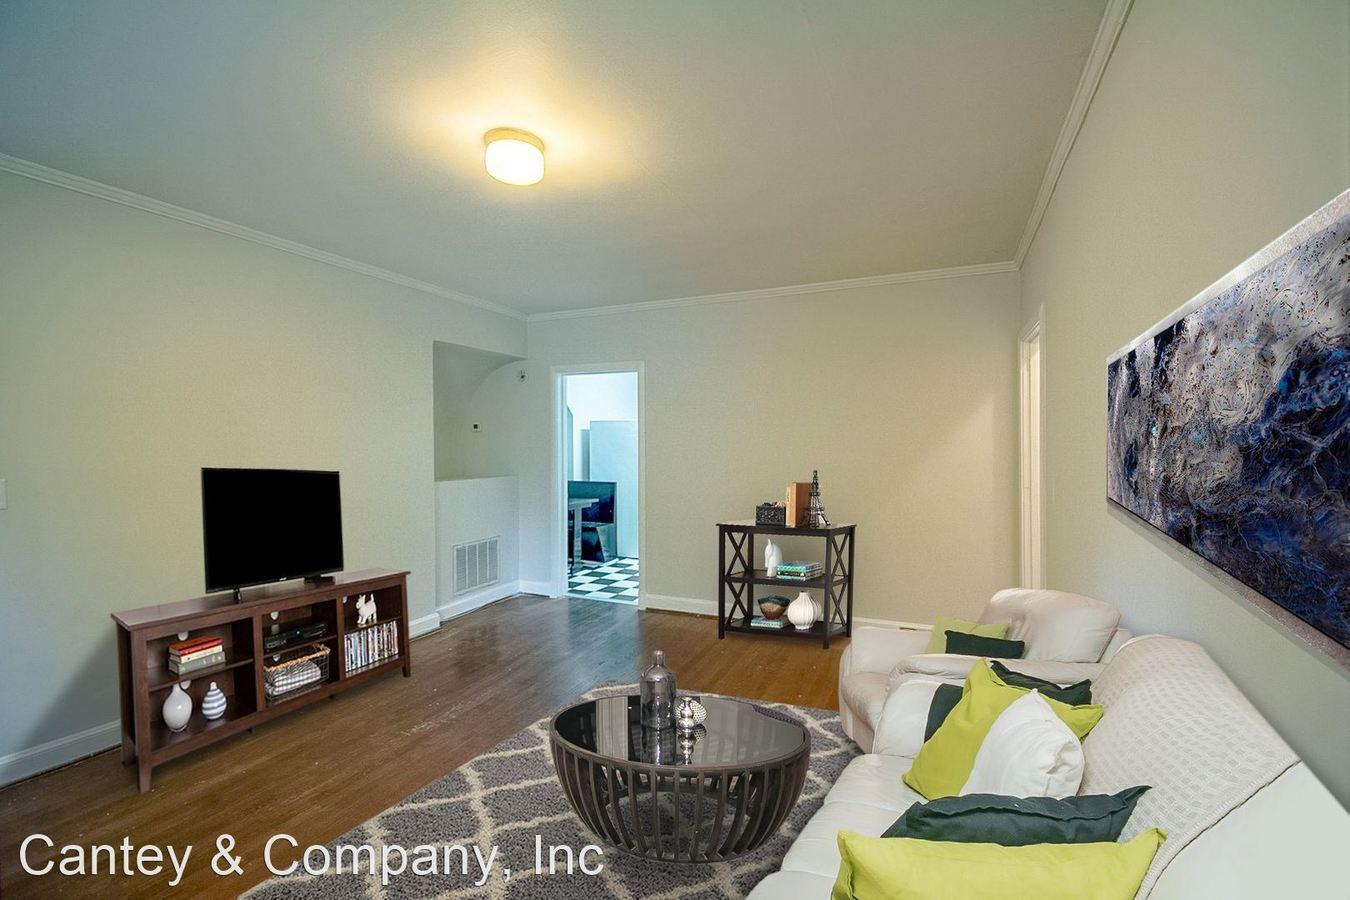 108 S Waccamaw Columbia Sc Apartment For Rent